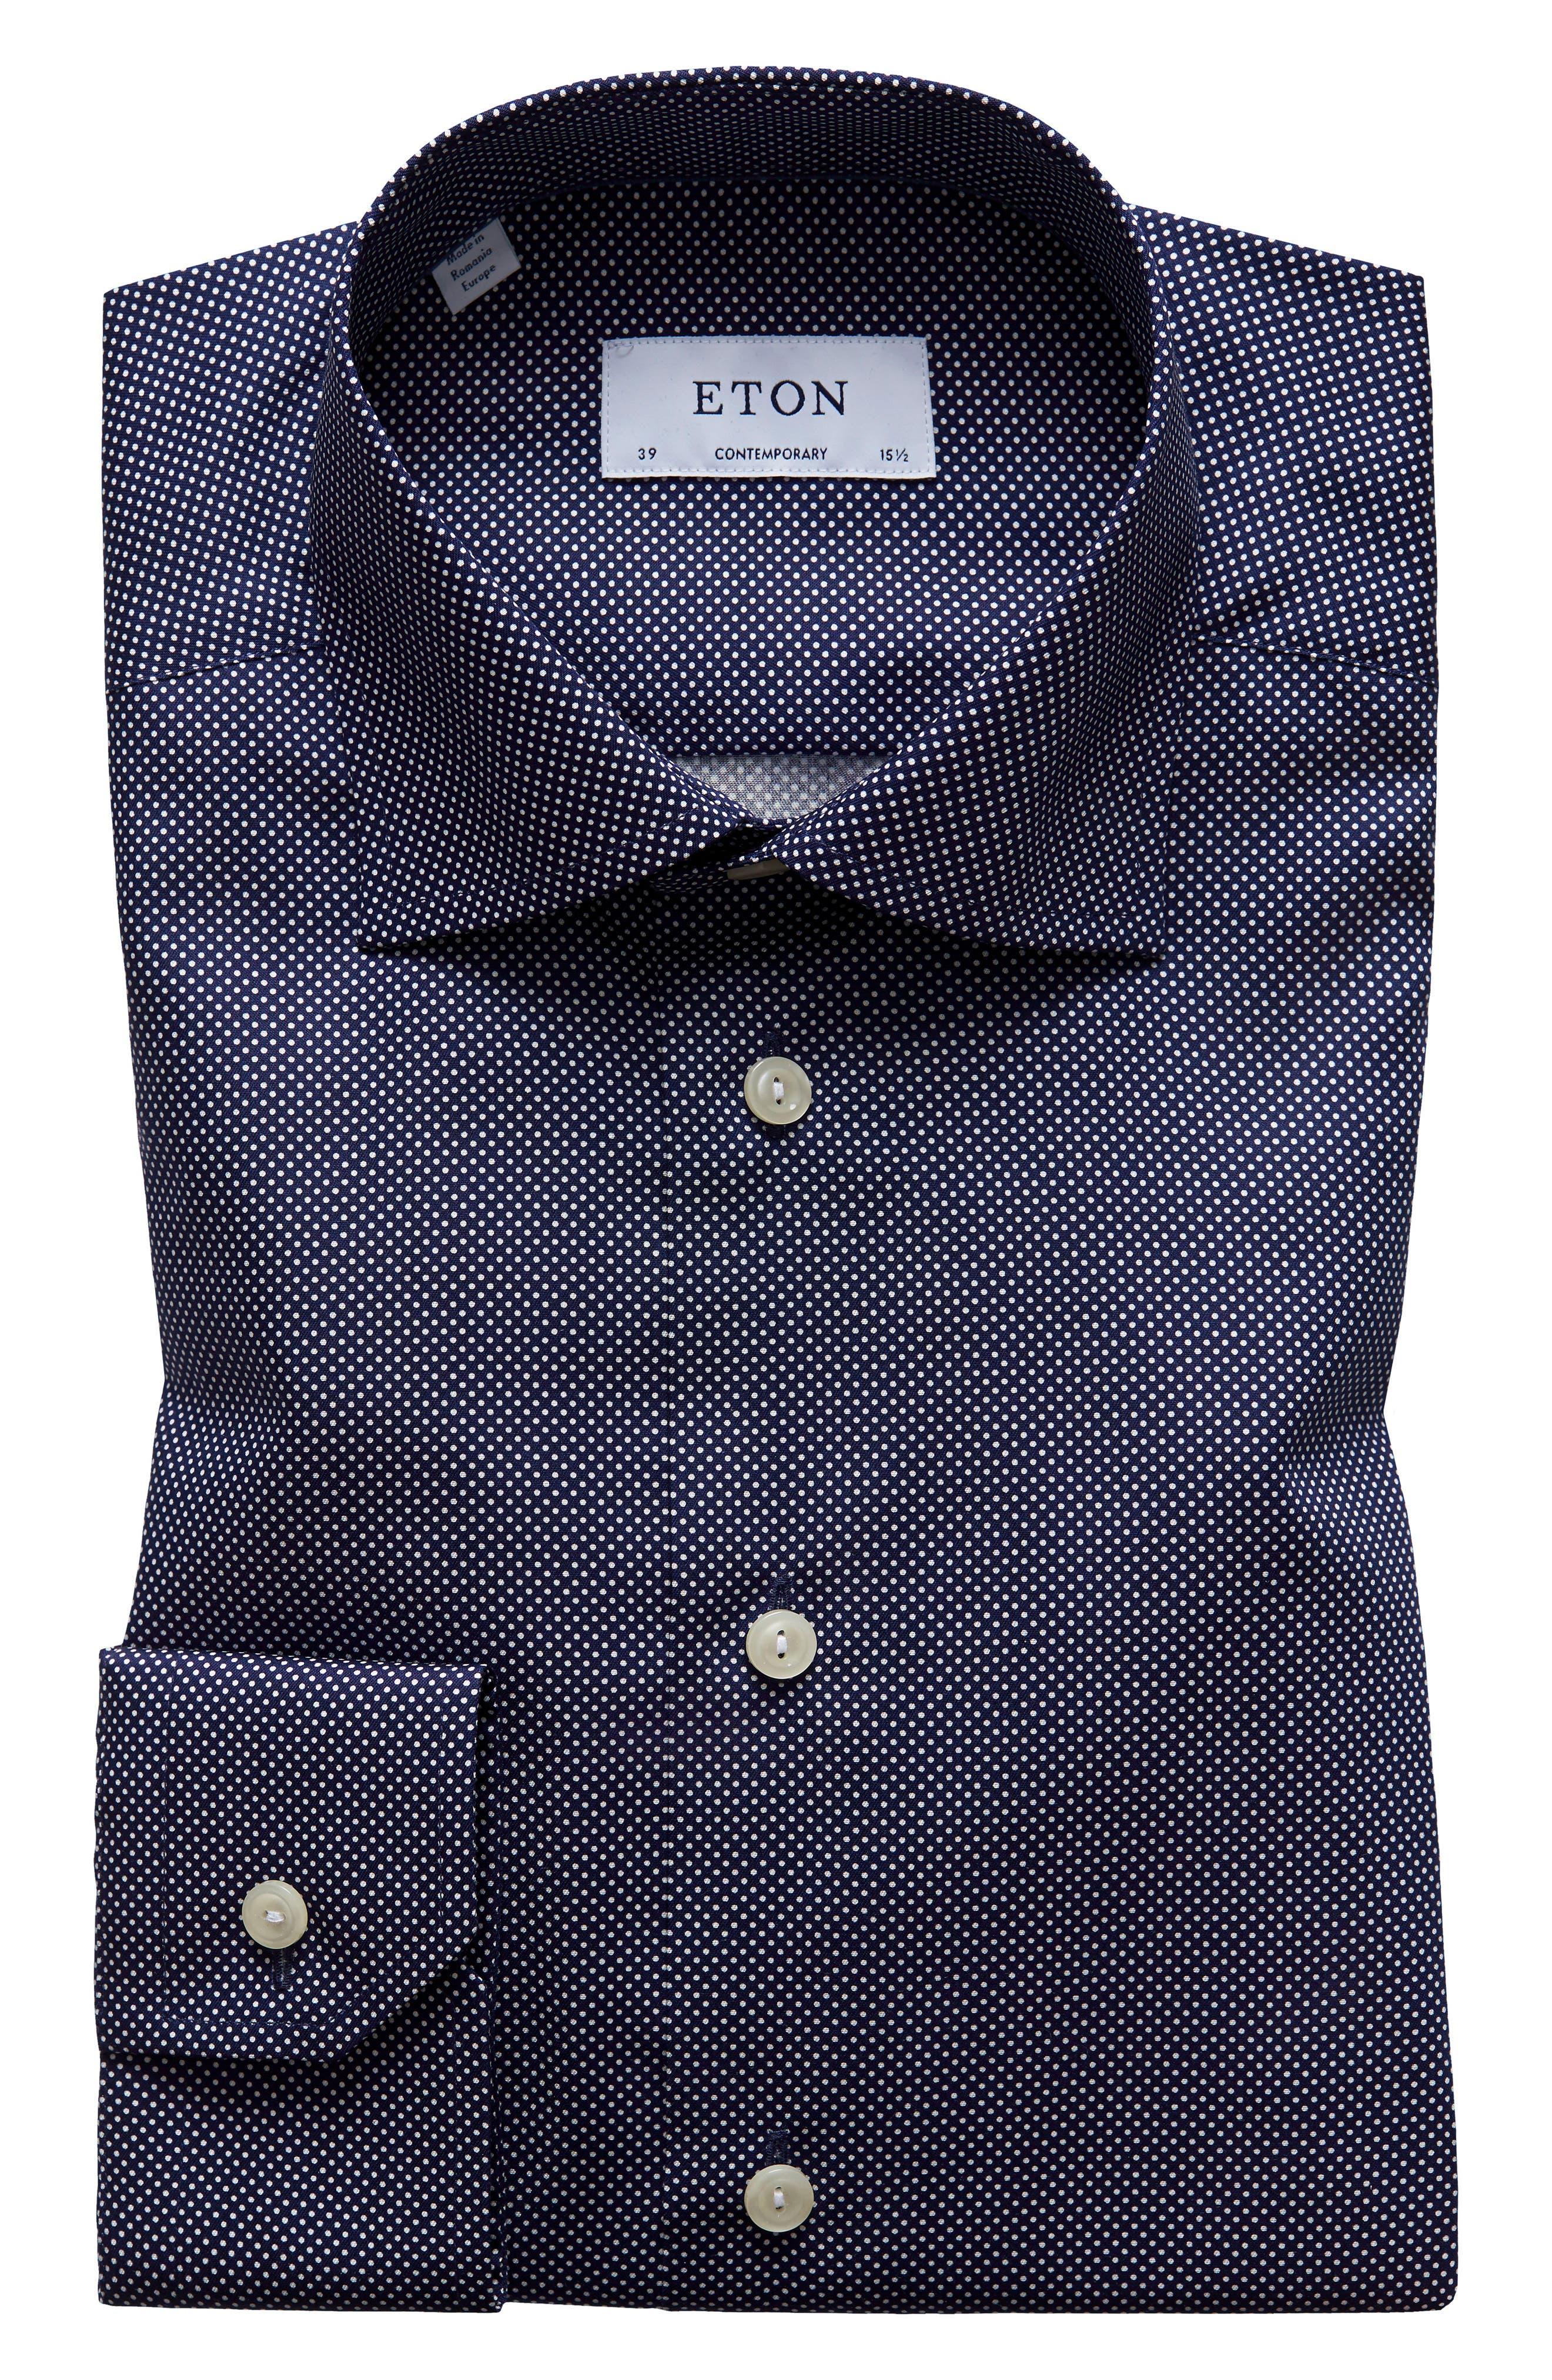 Alternate Image 1 Selected - Eton Contemporary Fit Signature Polka Dot Dress Shirt